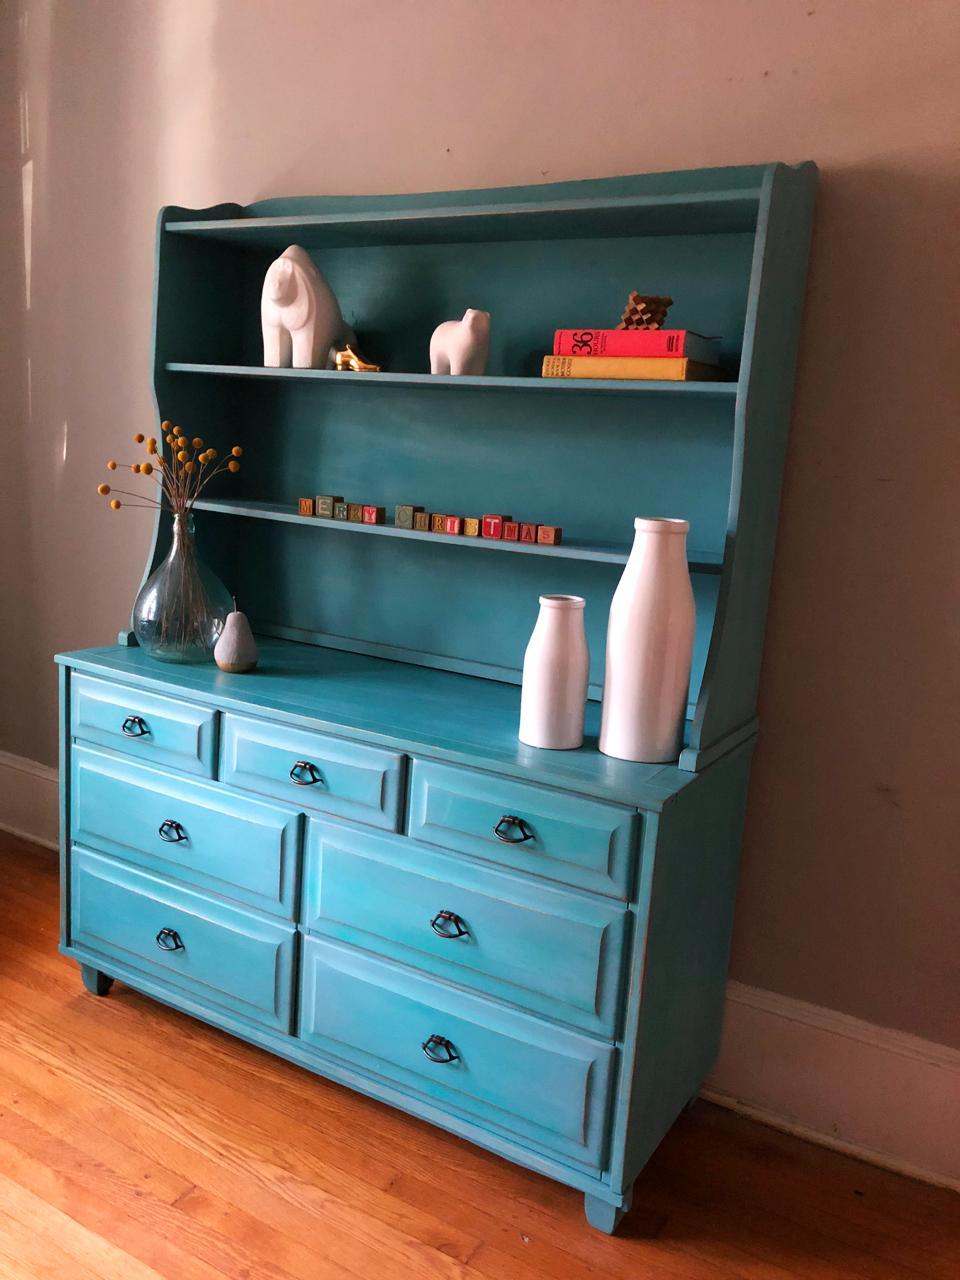 jo-torrijos-a-simpler-design-atlanta-painted-furniture-turquoise-buffet-hutch-6.jpg